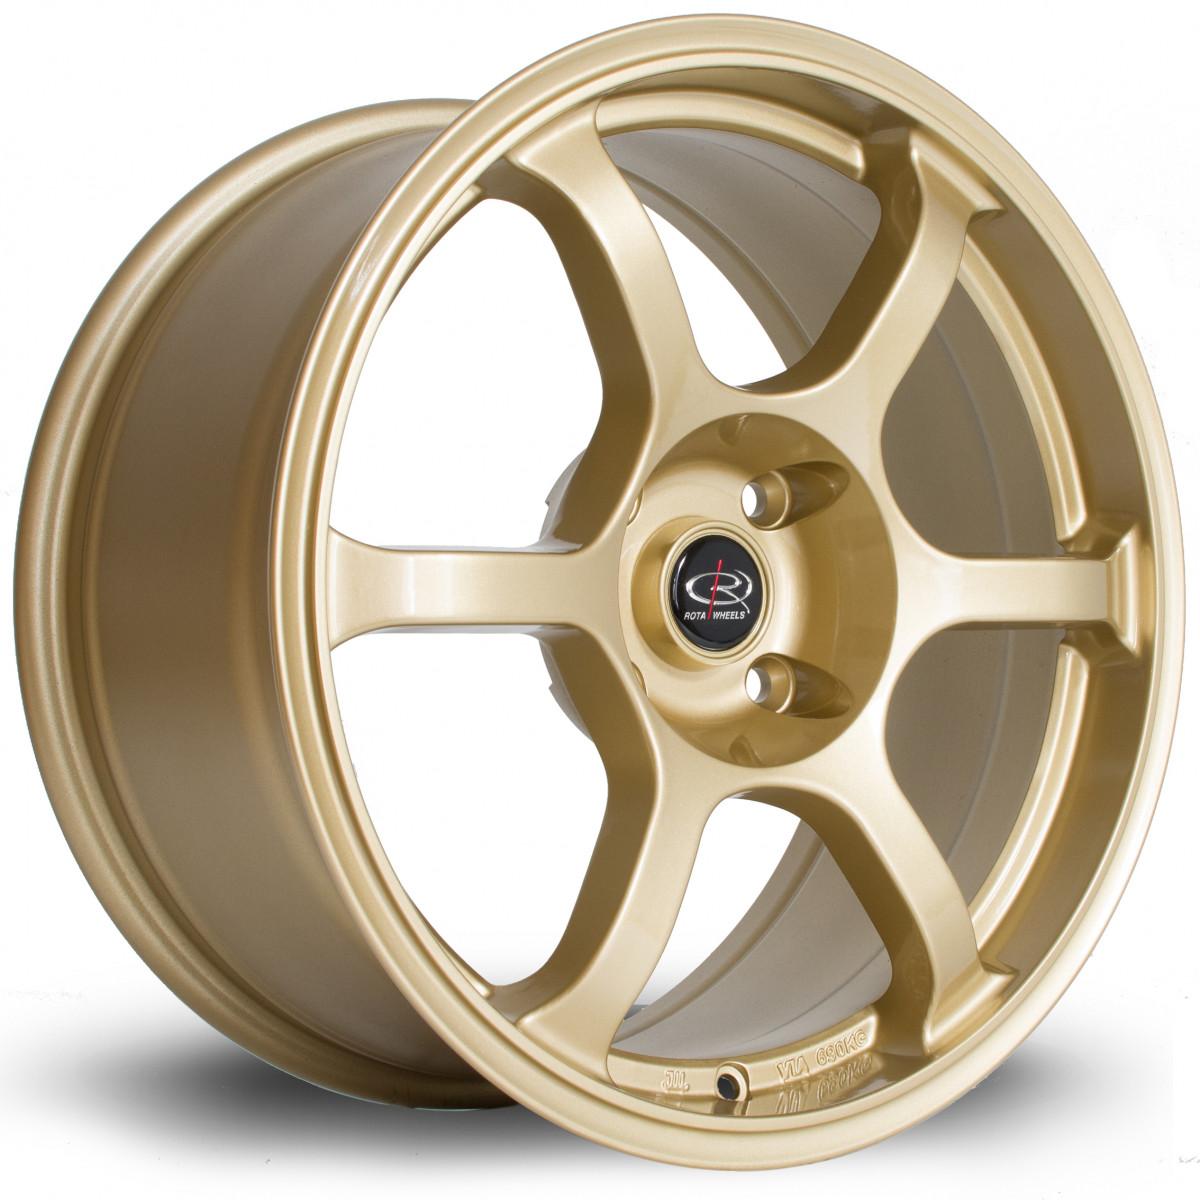 Boost 17x7.5 4x114 ET48 Gold